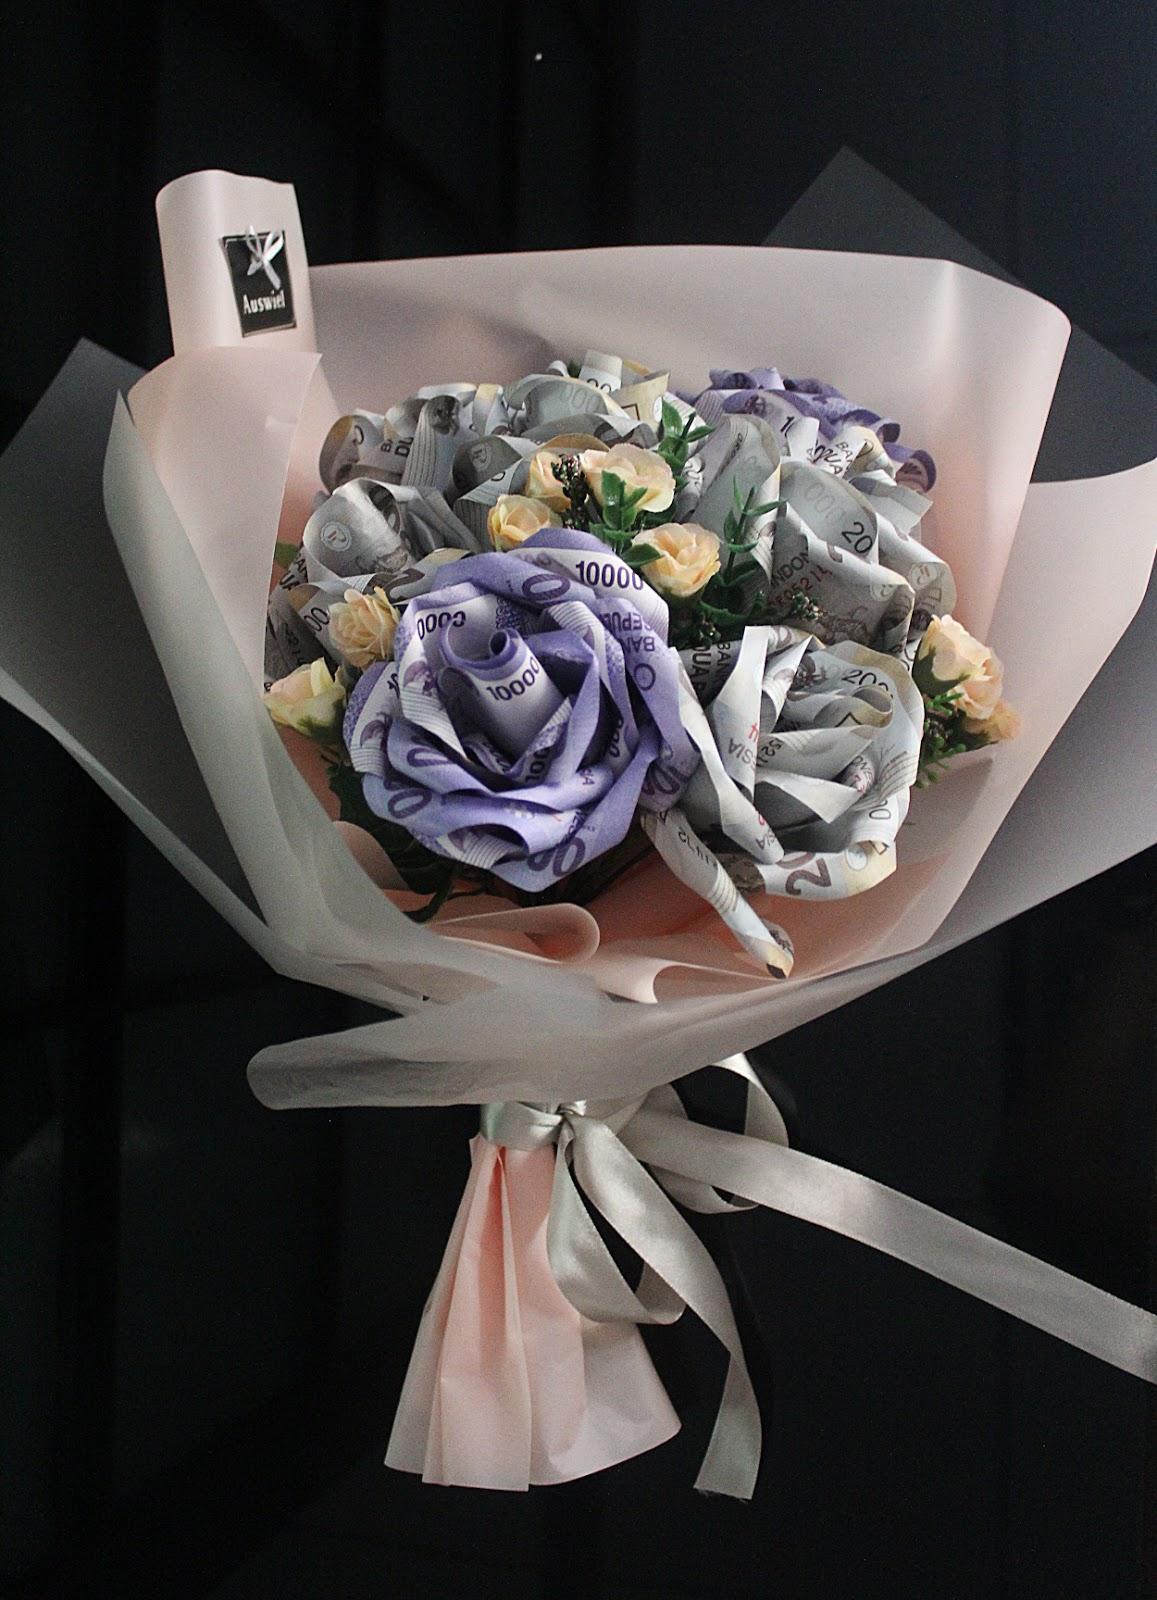 Auswiel Flower Design: Roses Money Bouquet